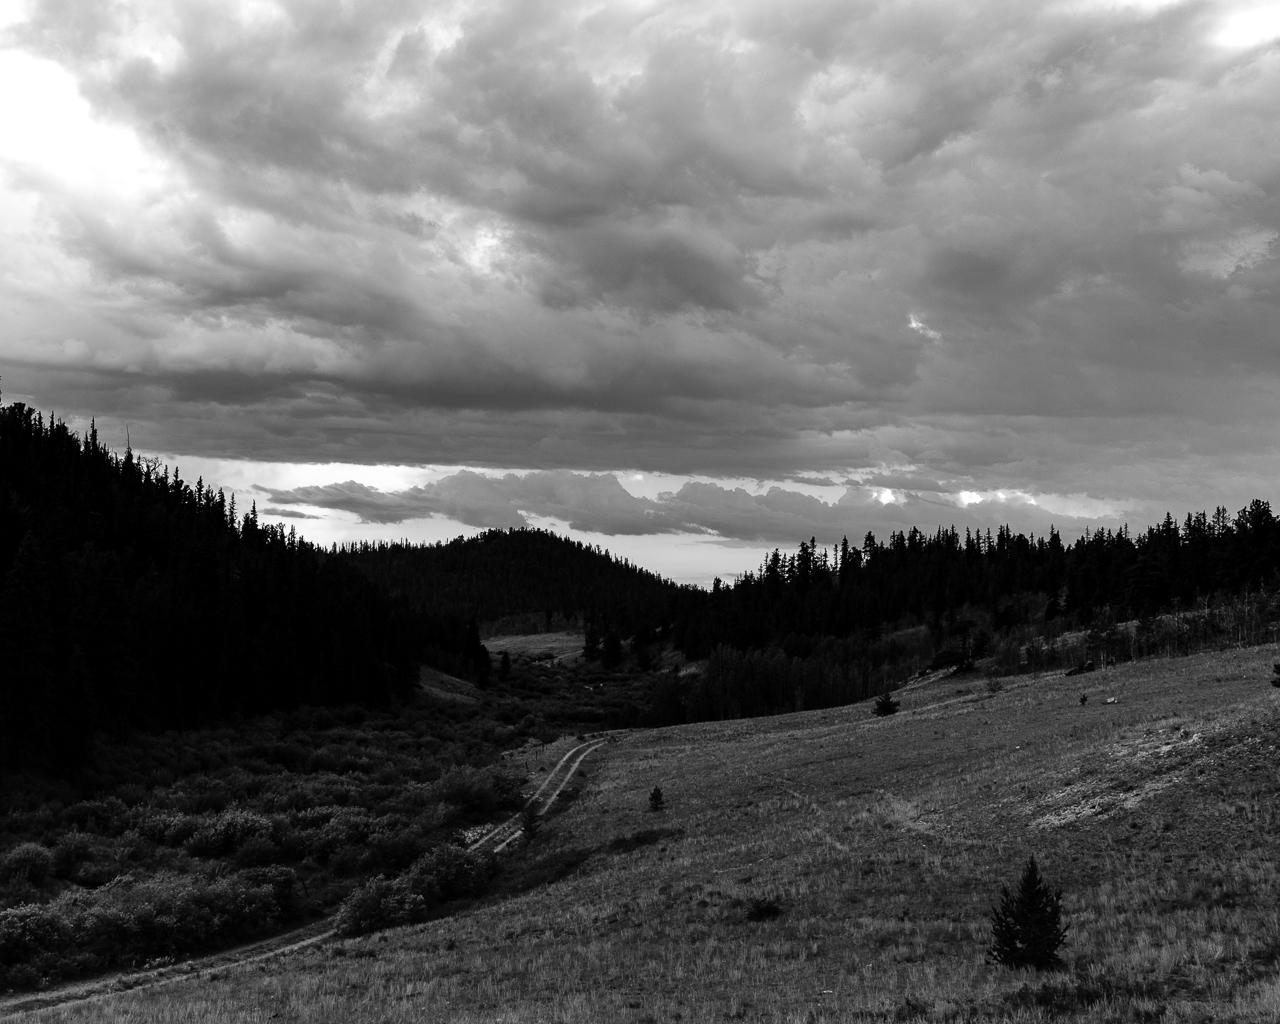 Day 200 - 365 Day B&W Photo Challenge - Trail into the wilderness - Fuji X-T3, XF 23mm f/2, Acros R Film Simulation